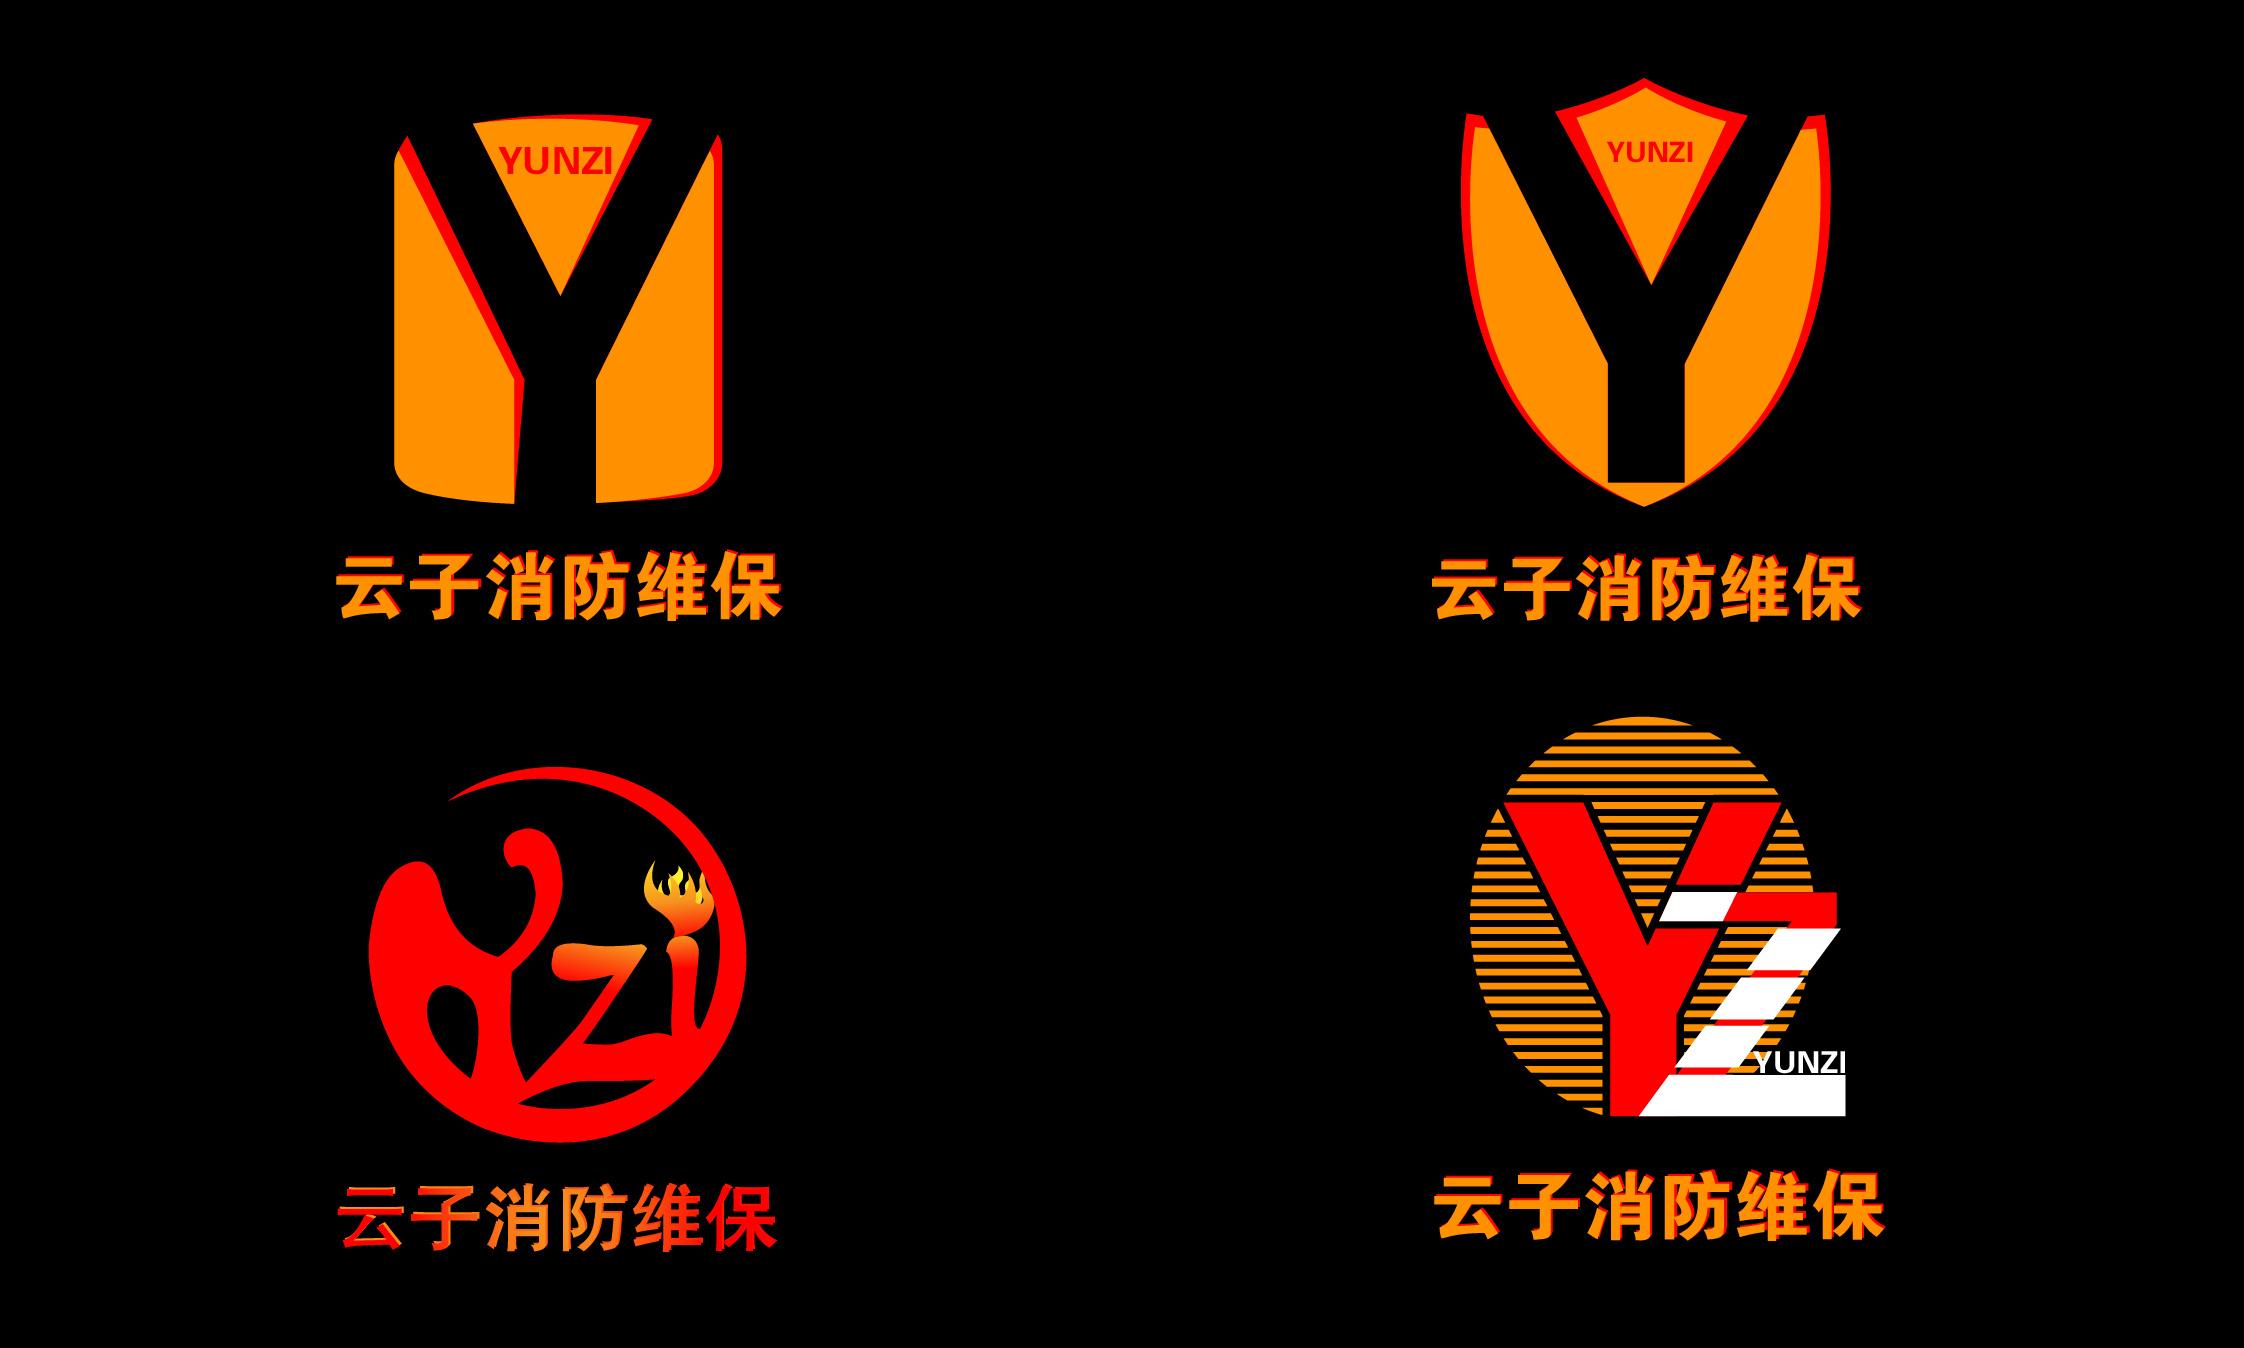 消防logo